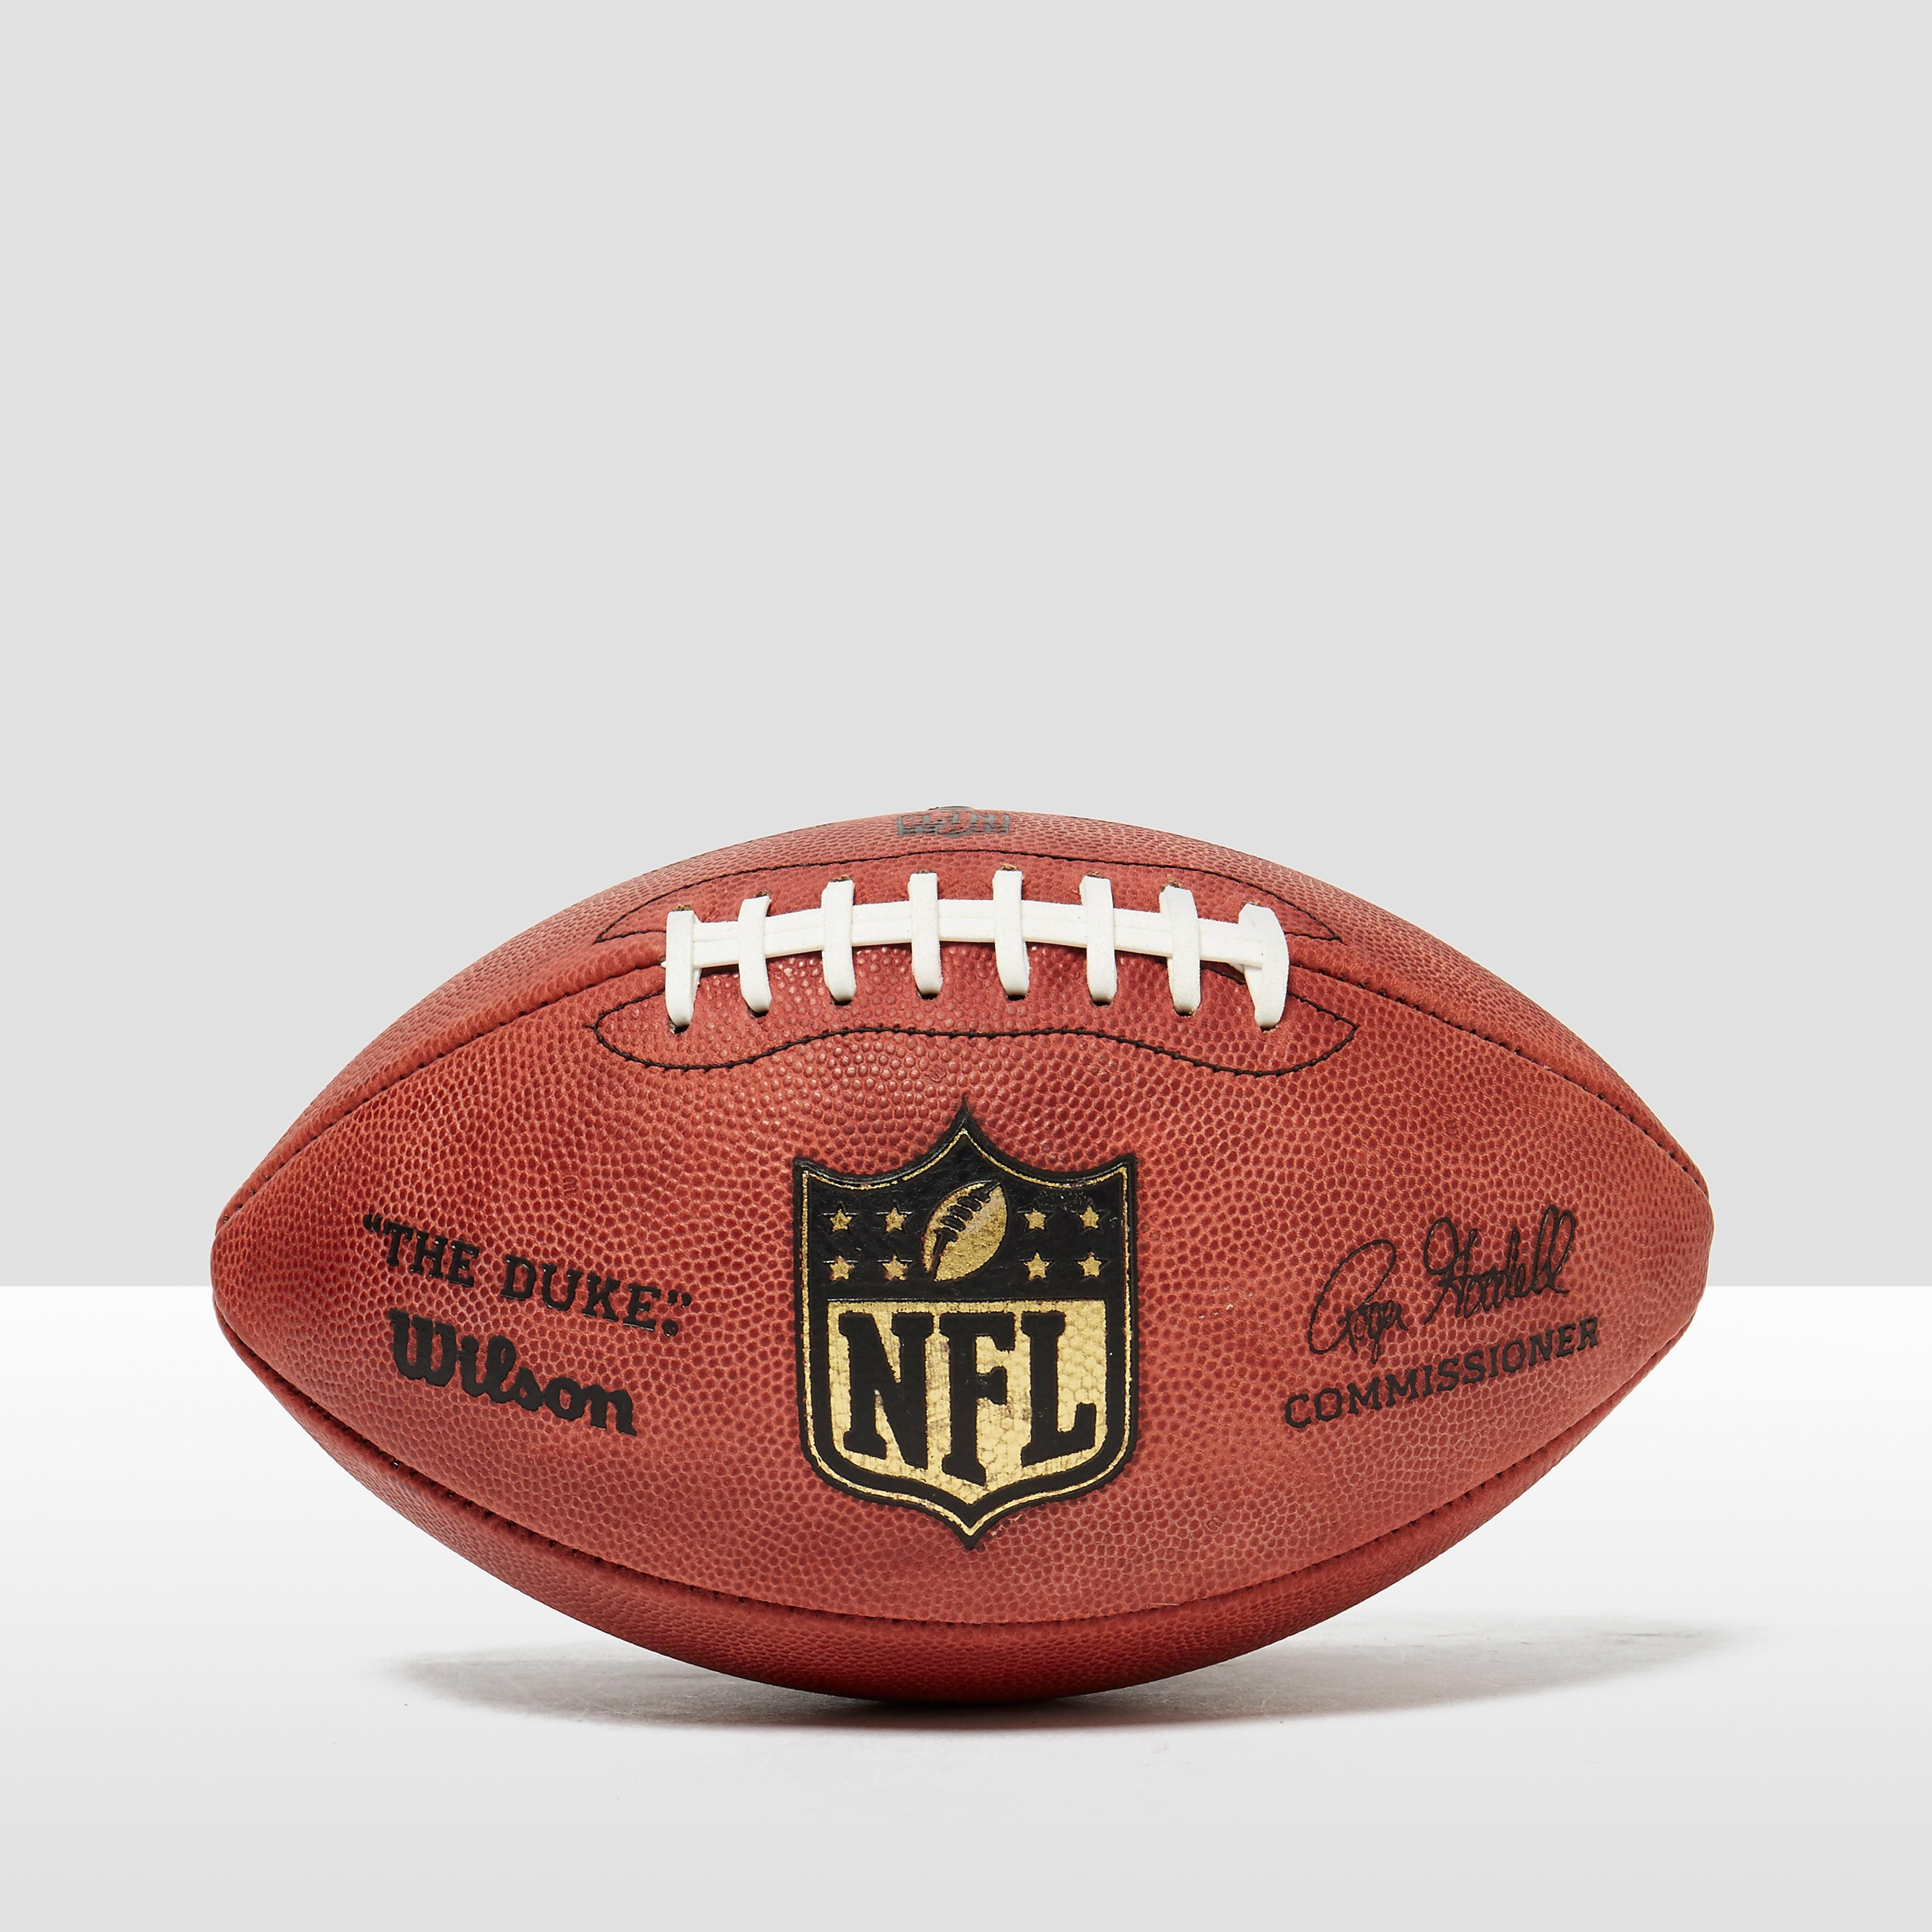 Wilson NFL Game Ball